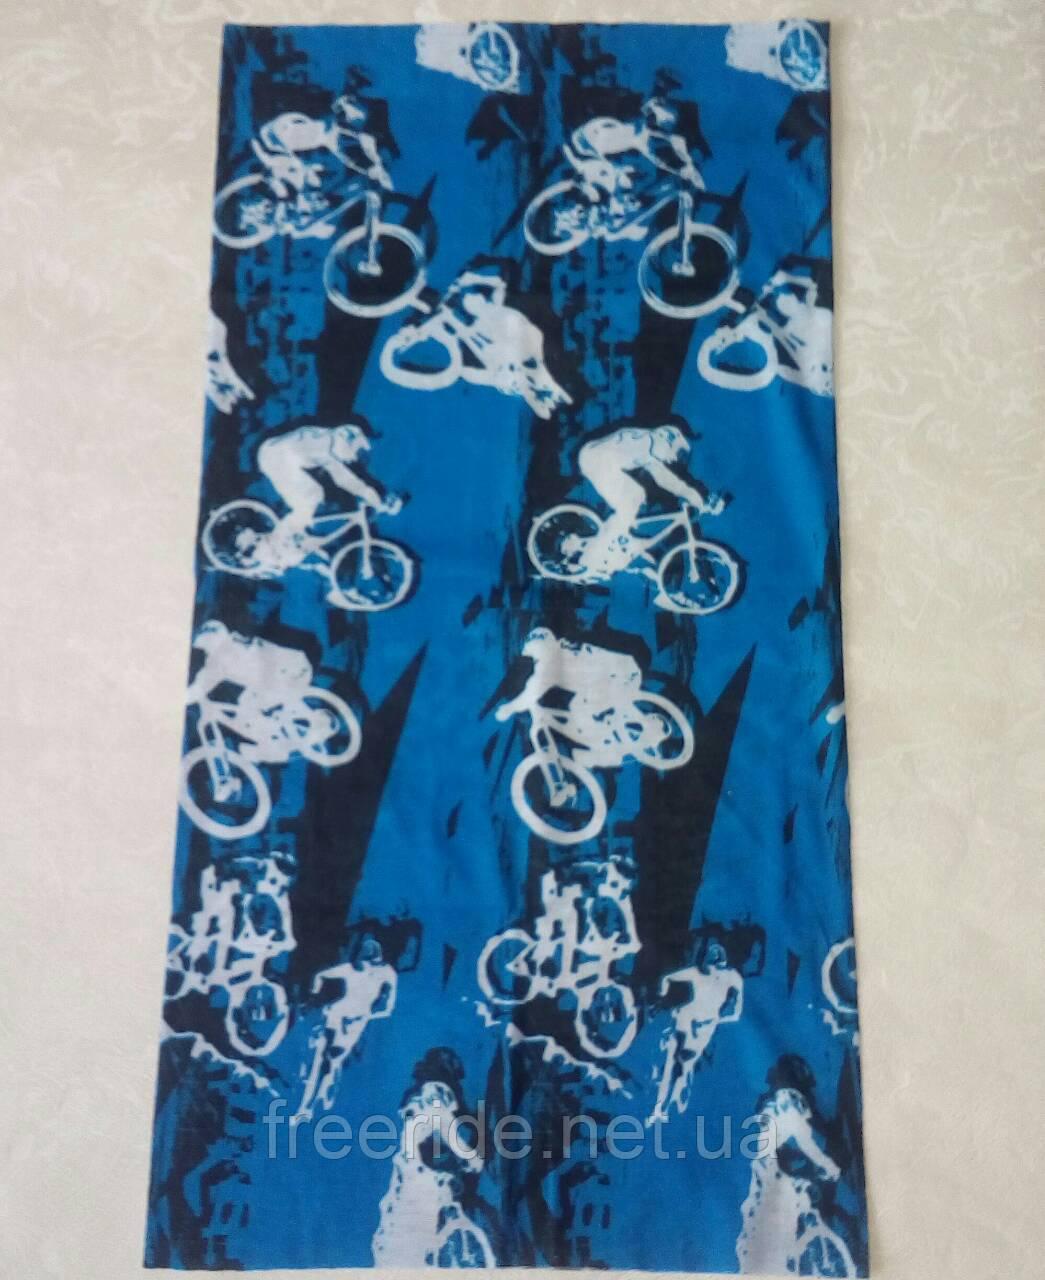 Летний бафф, buff, бесшовный шарф, повязка (#445)